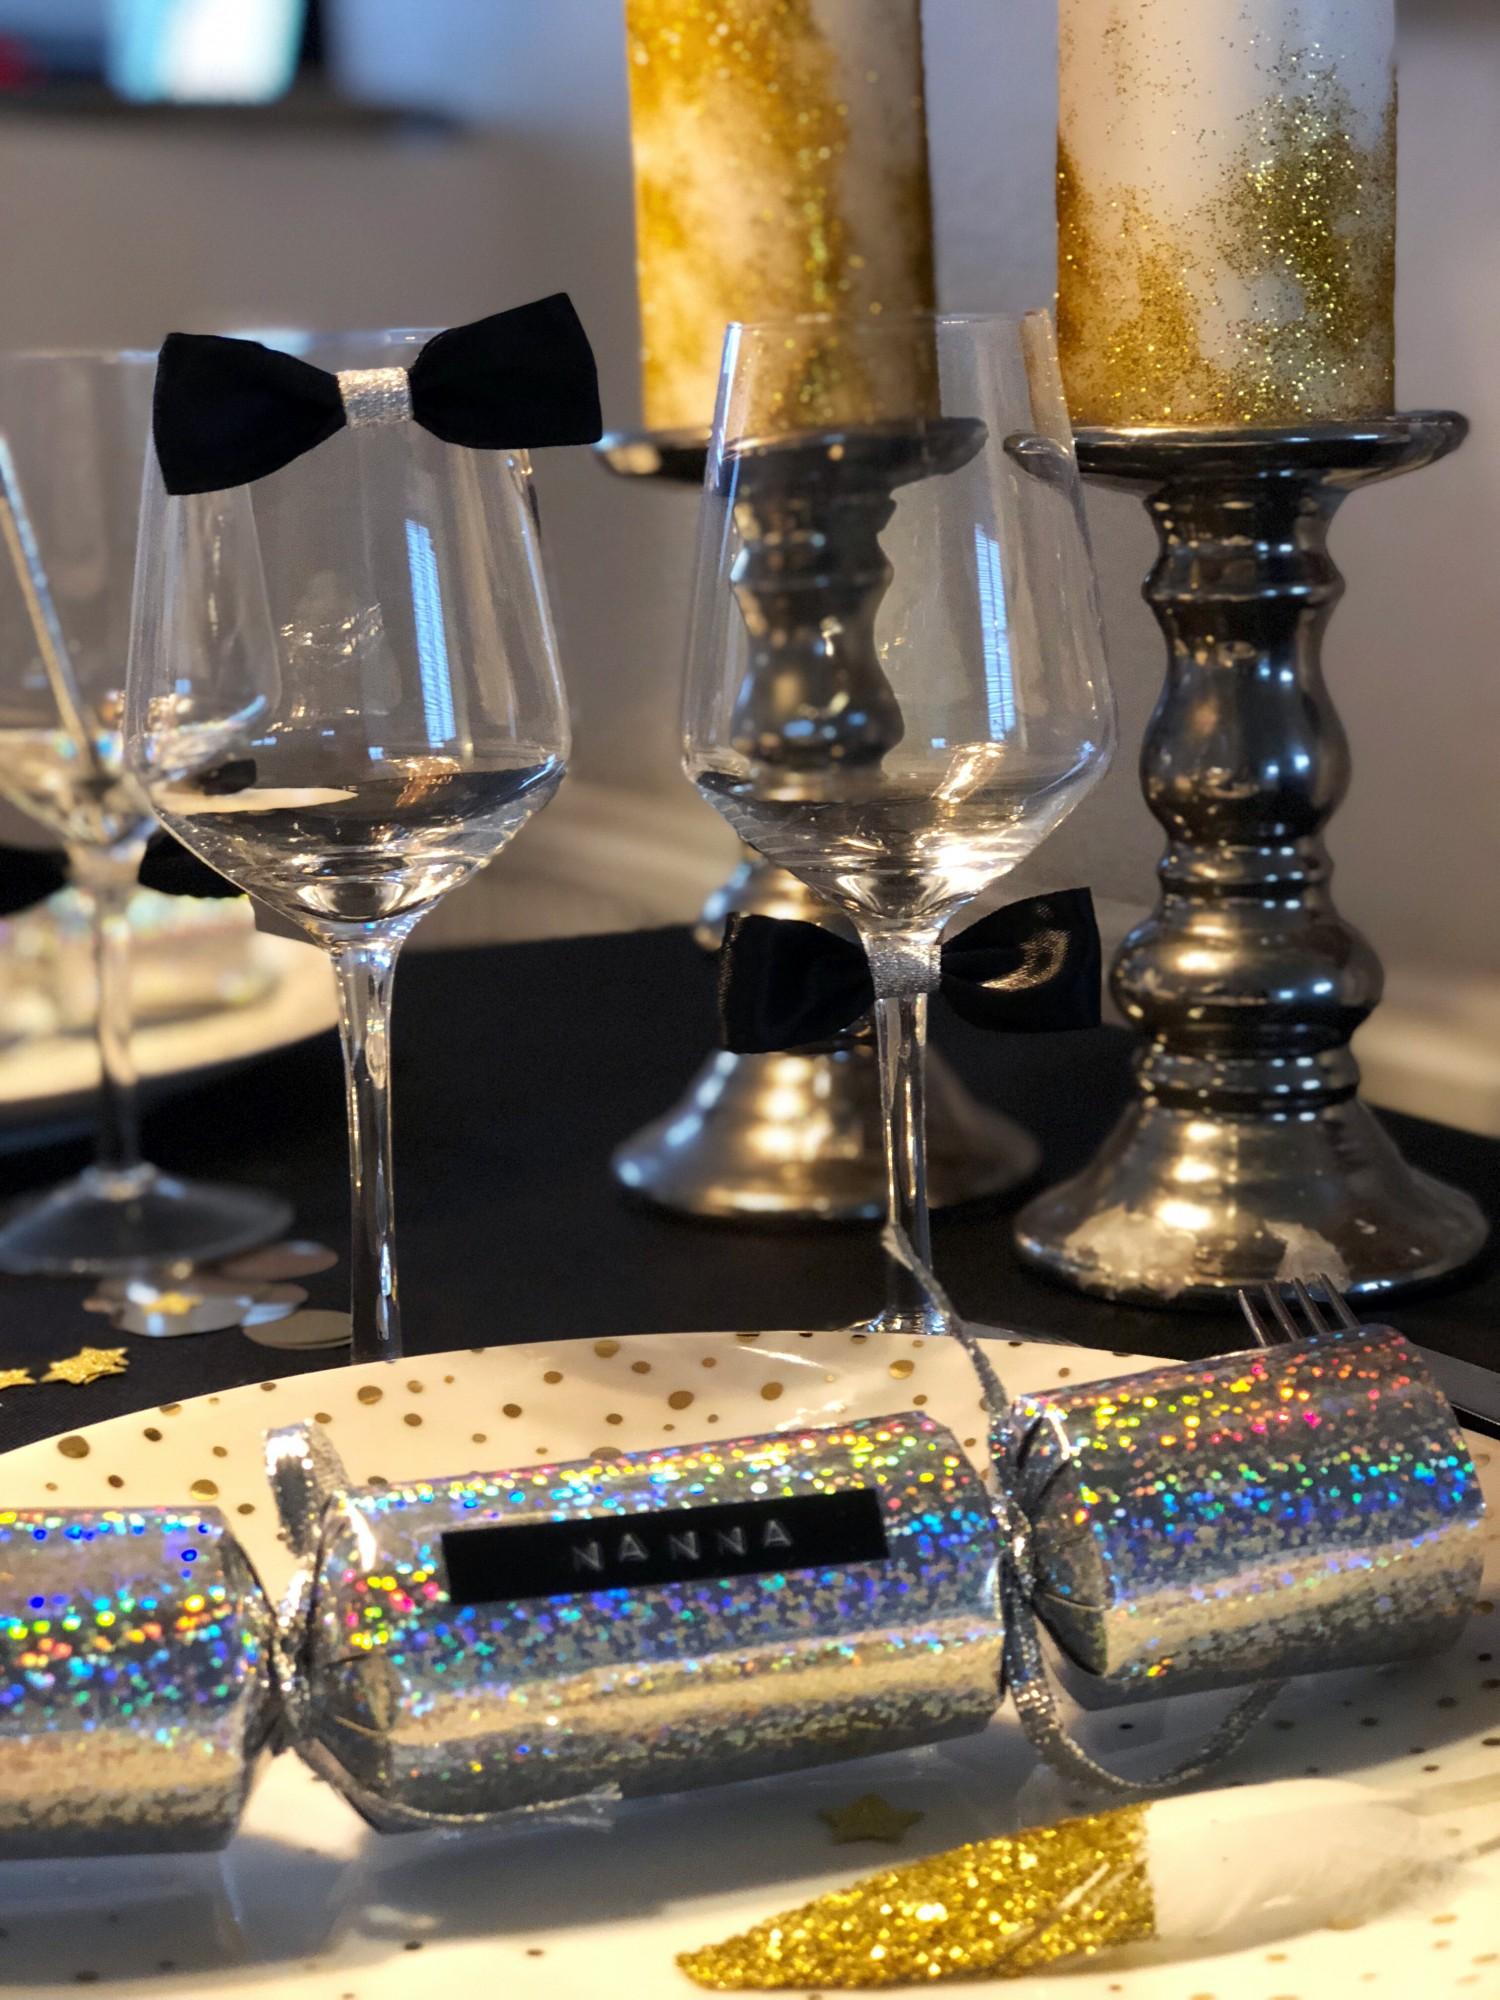 DIY nytårspynt til nytårsbordet